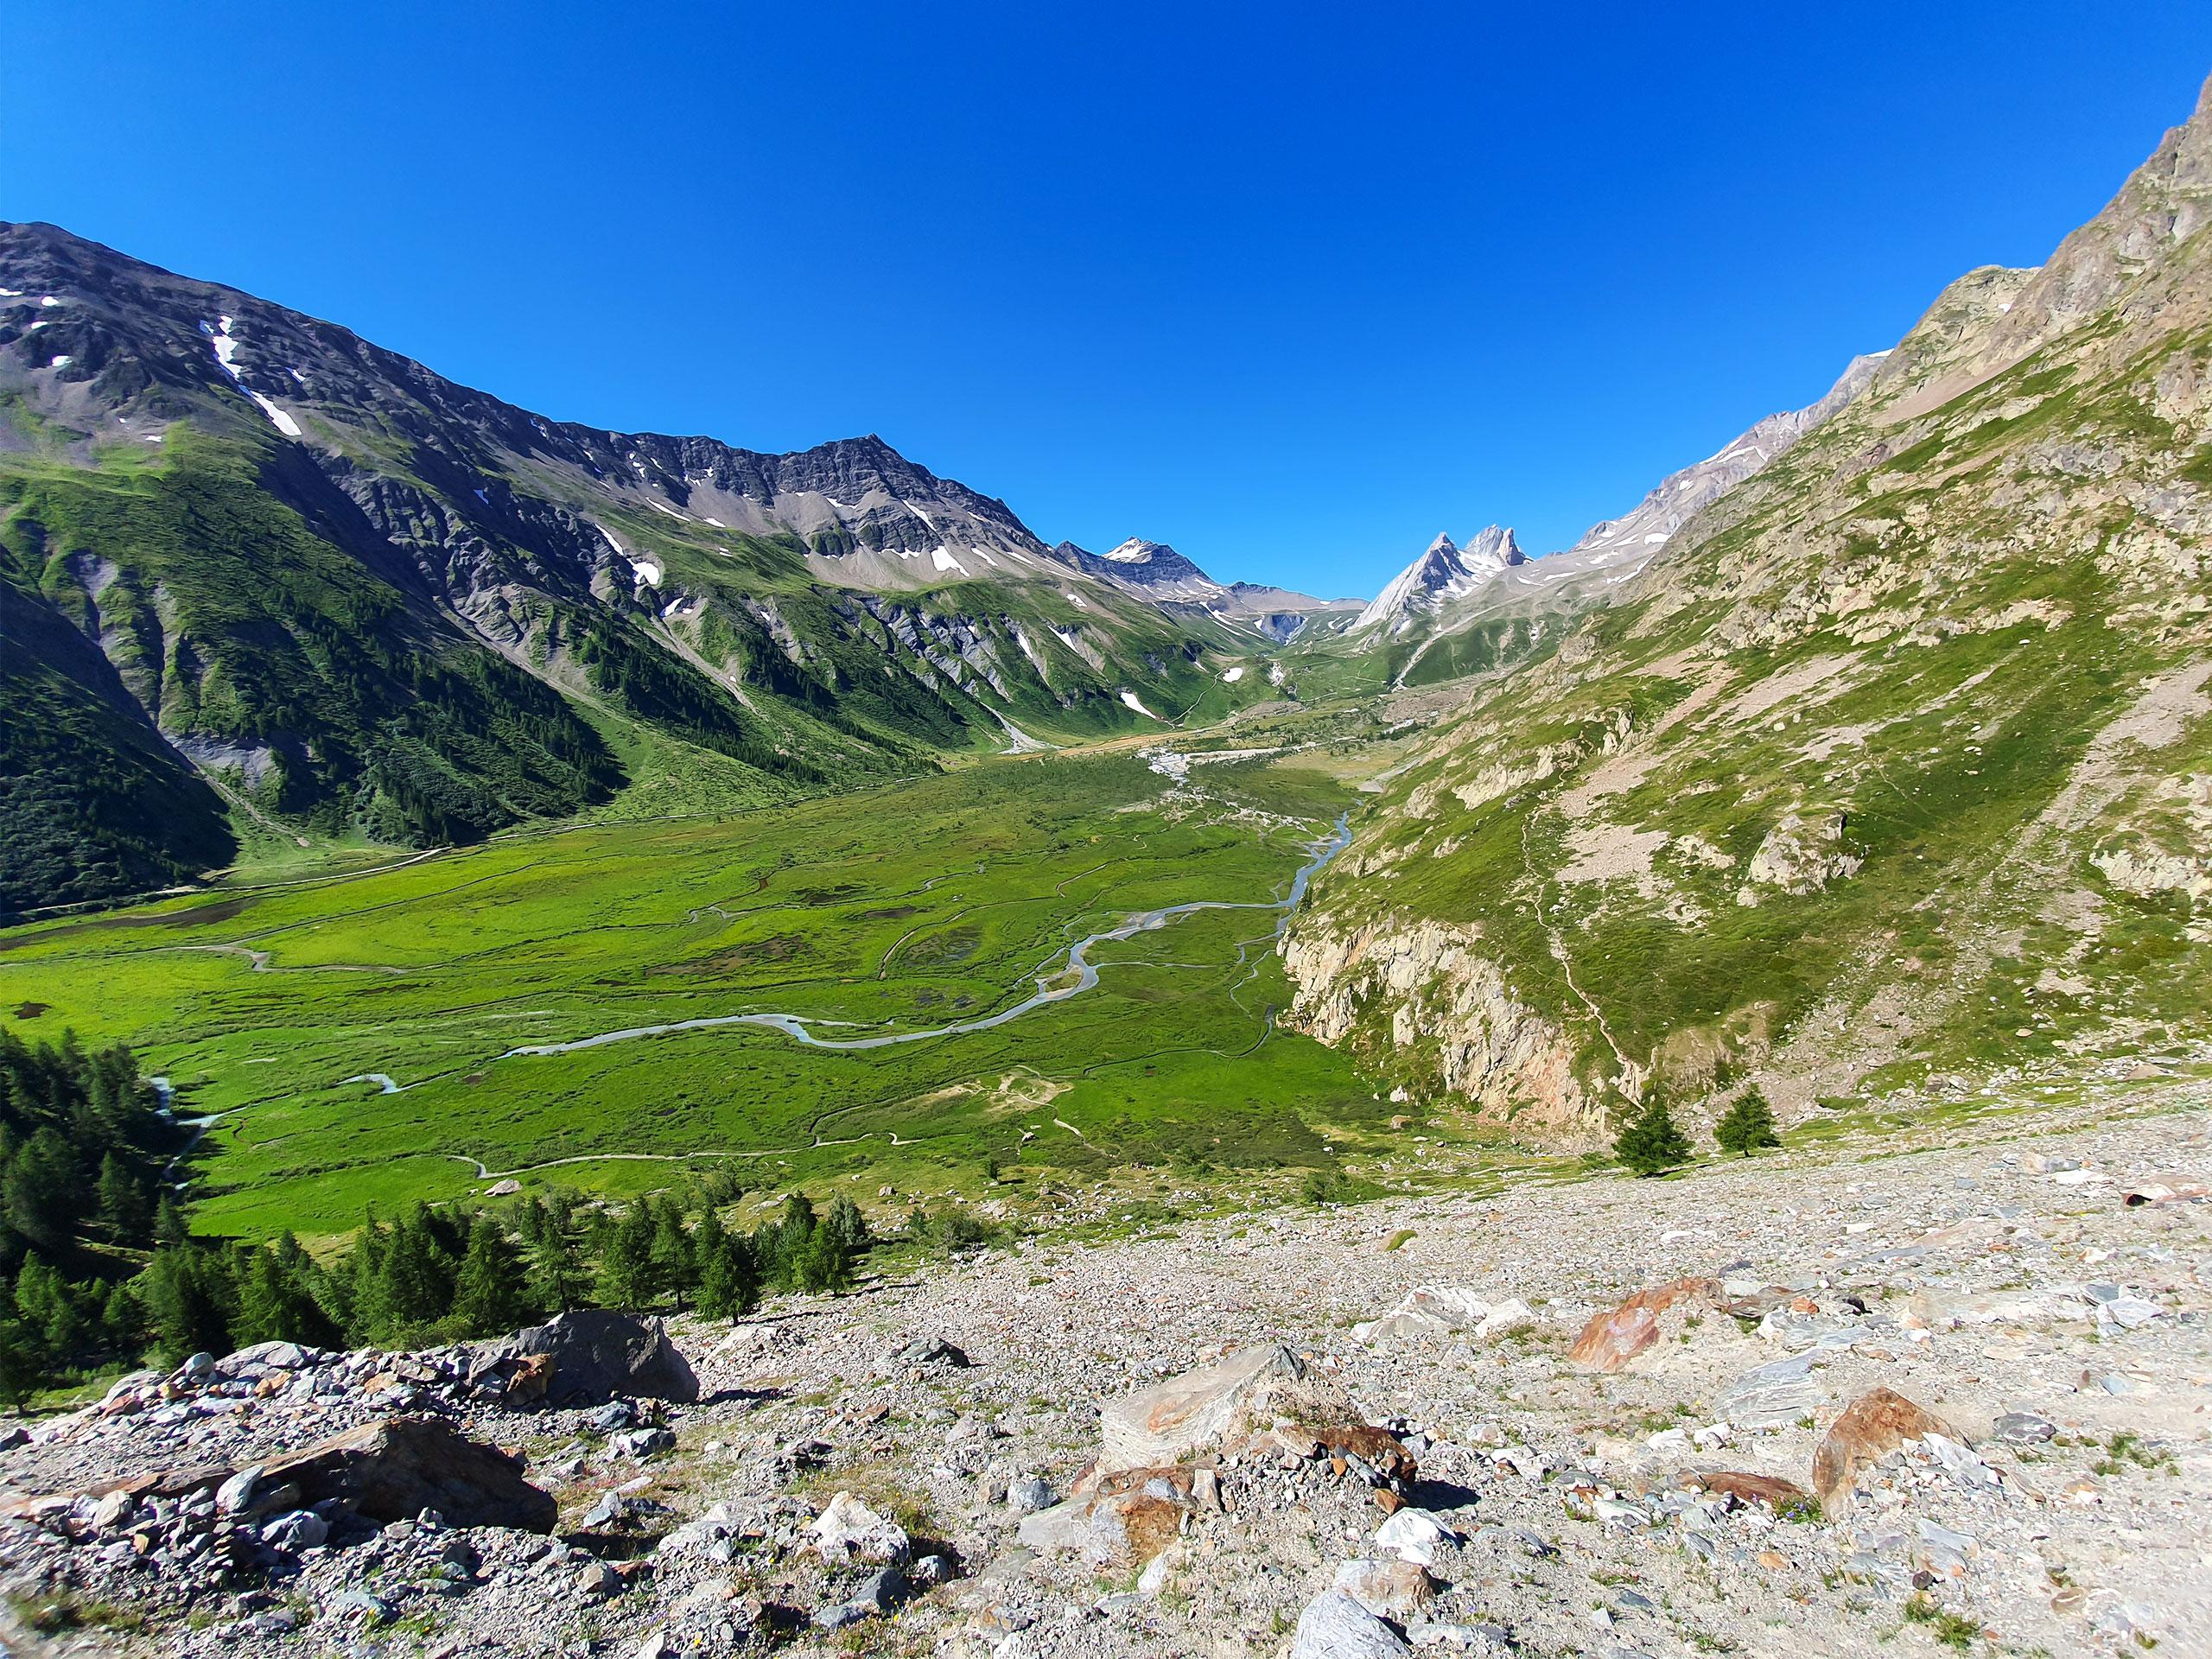 alps valley stunning landscape